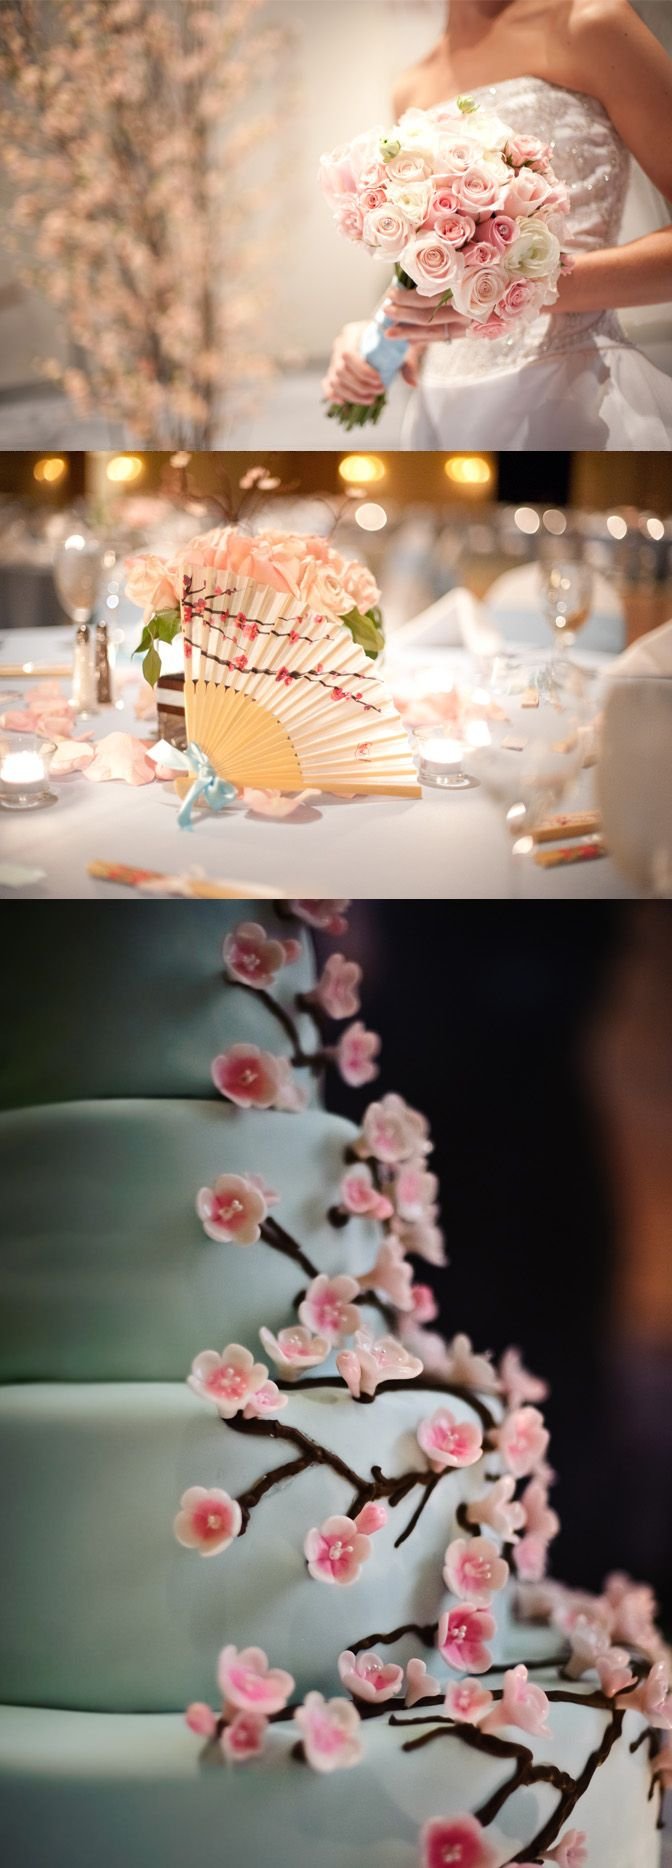 Multicultural Korean American Wedding - cherry blossoms as decor